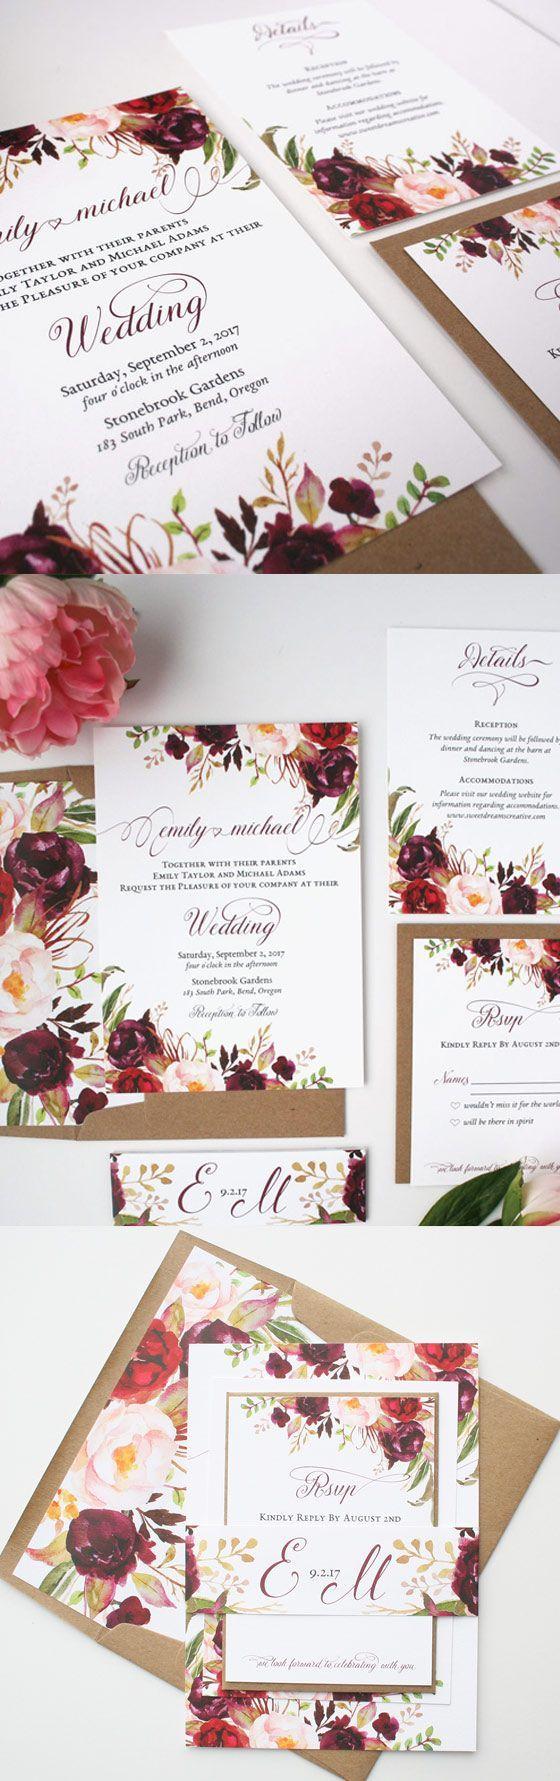 best wedding card manufacturers in delhi%0A Love these burgundy  u     blush wedding invitations